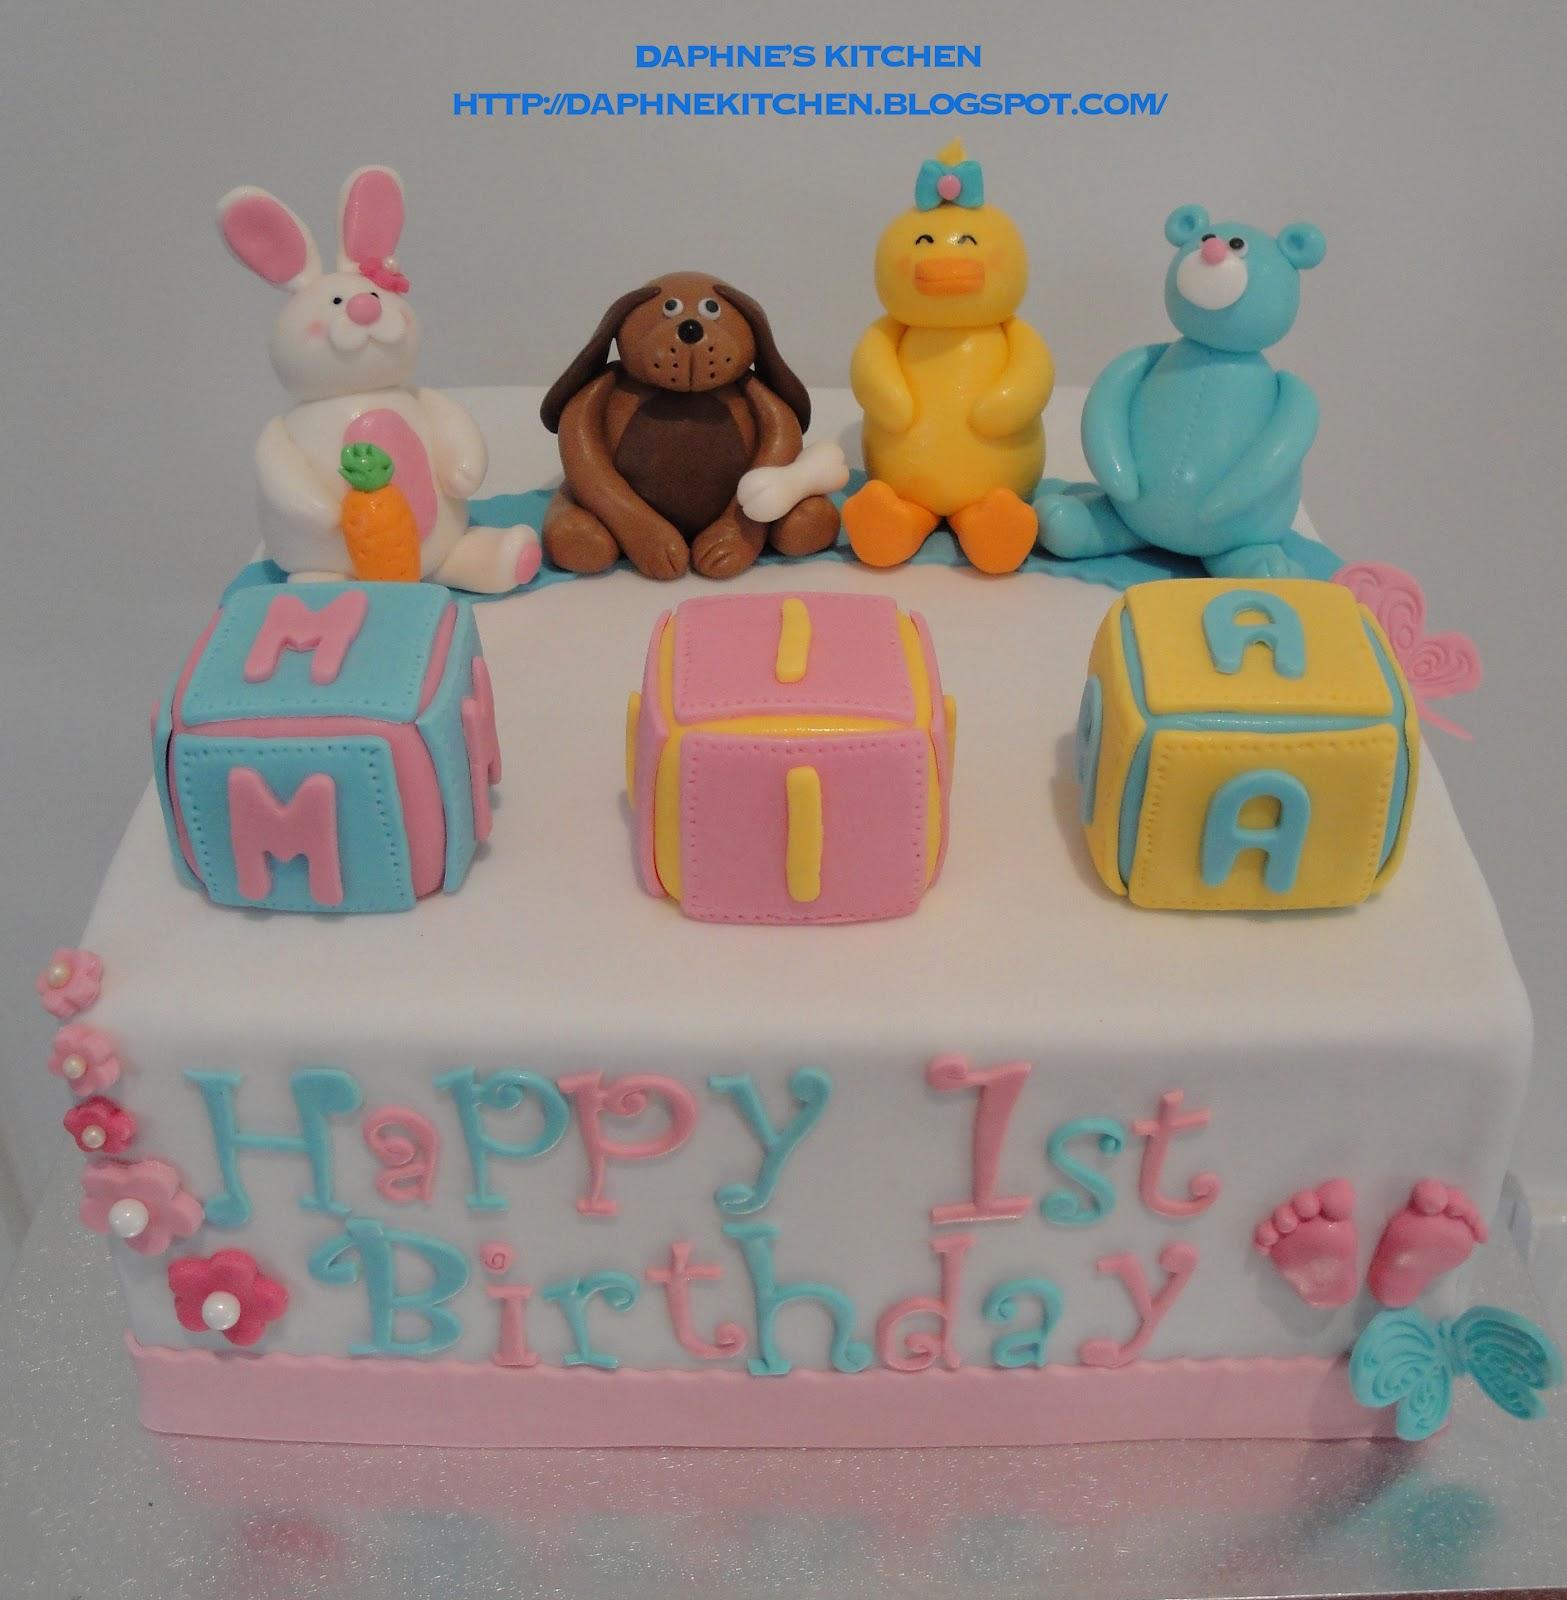 Daphne Made Her Own Birthday Cake Too: Daphne's Kitchen: MIA 1st Birthday Party :